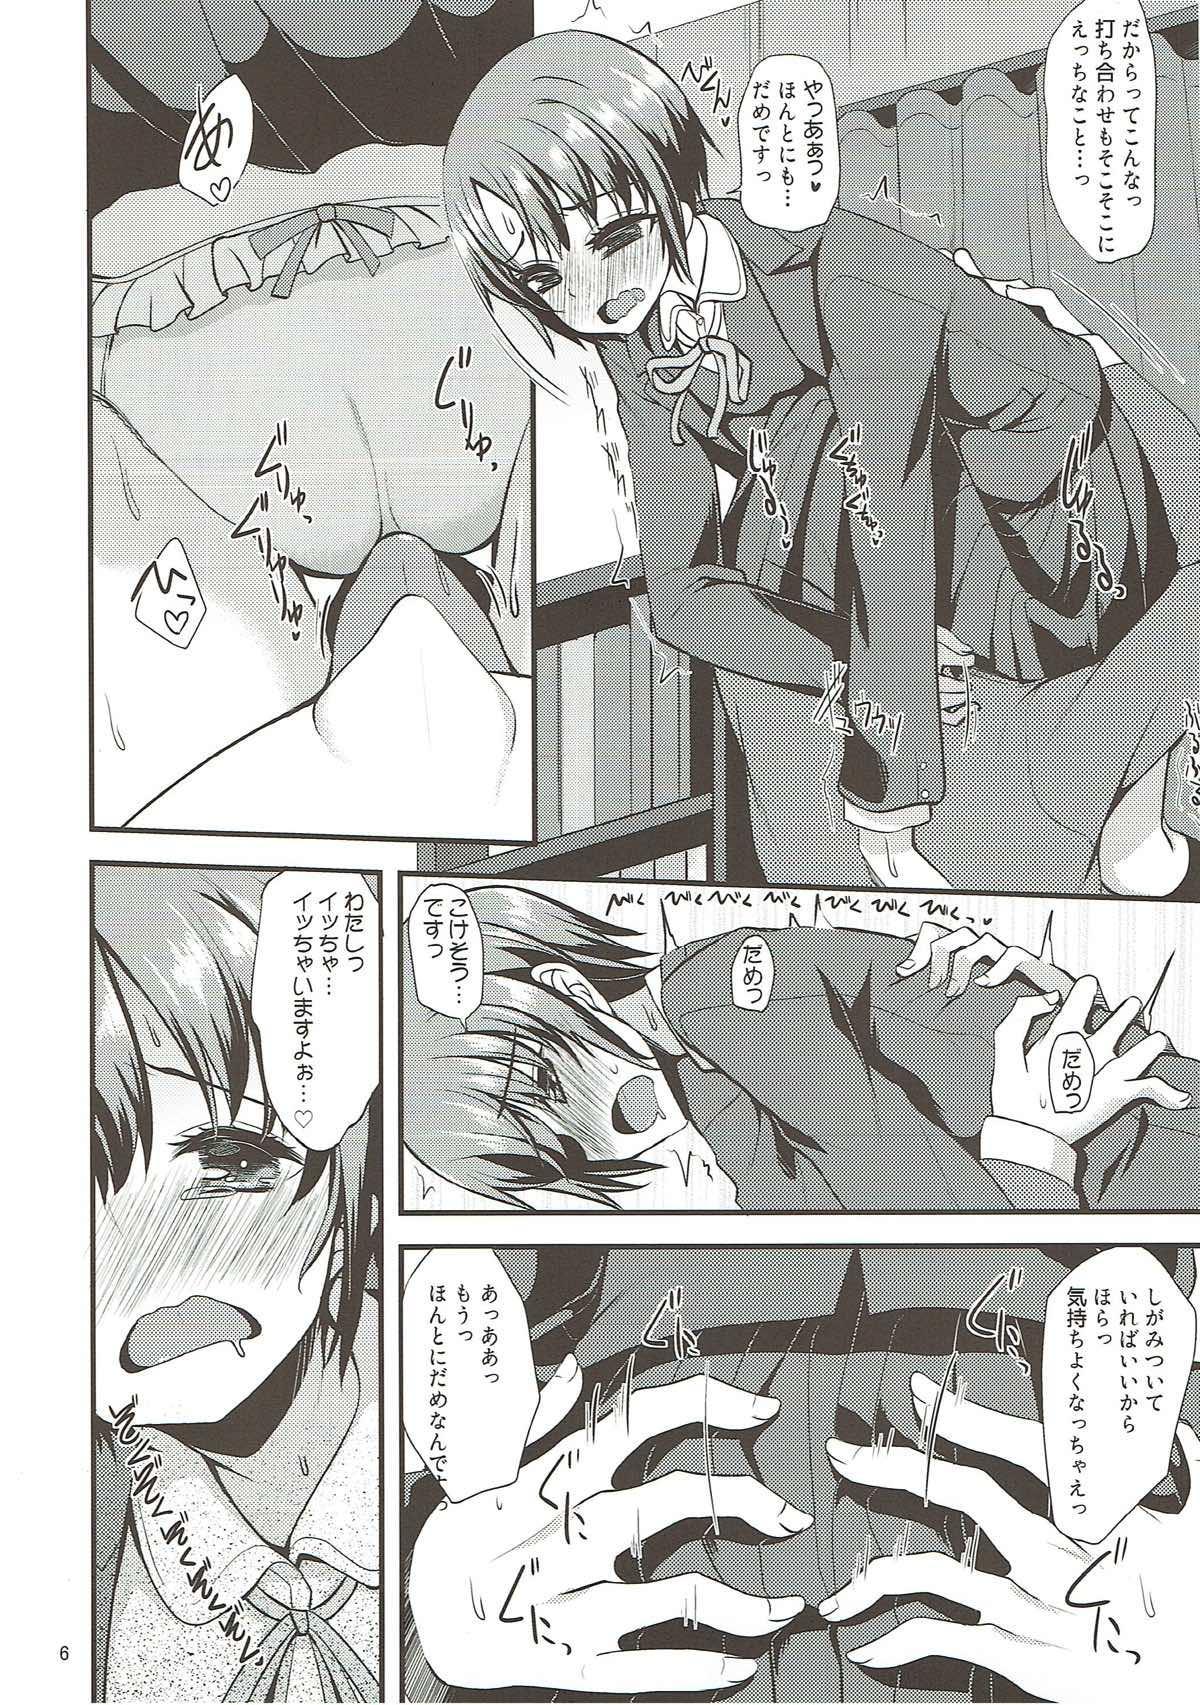 Idol ga Seifuku ni Kigaetara 4